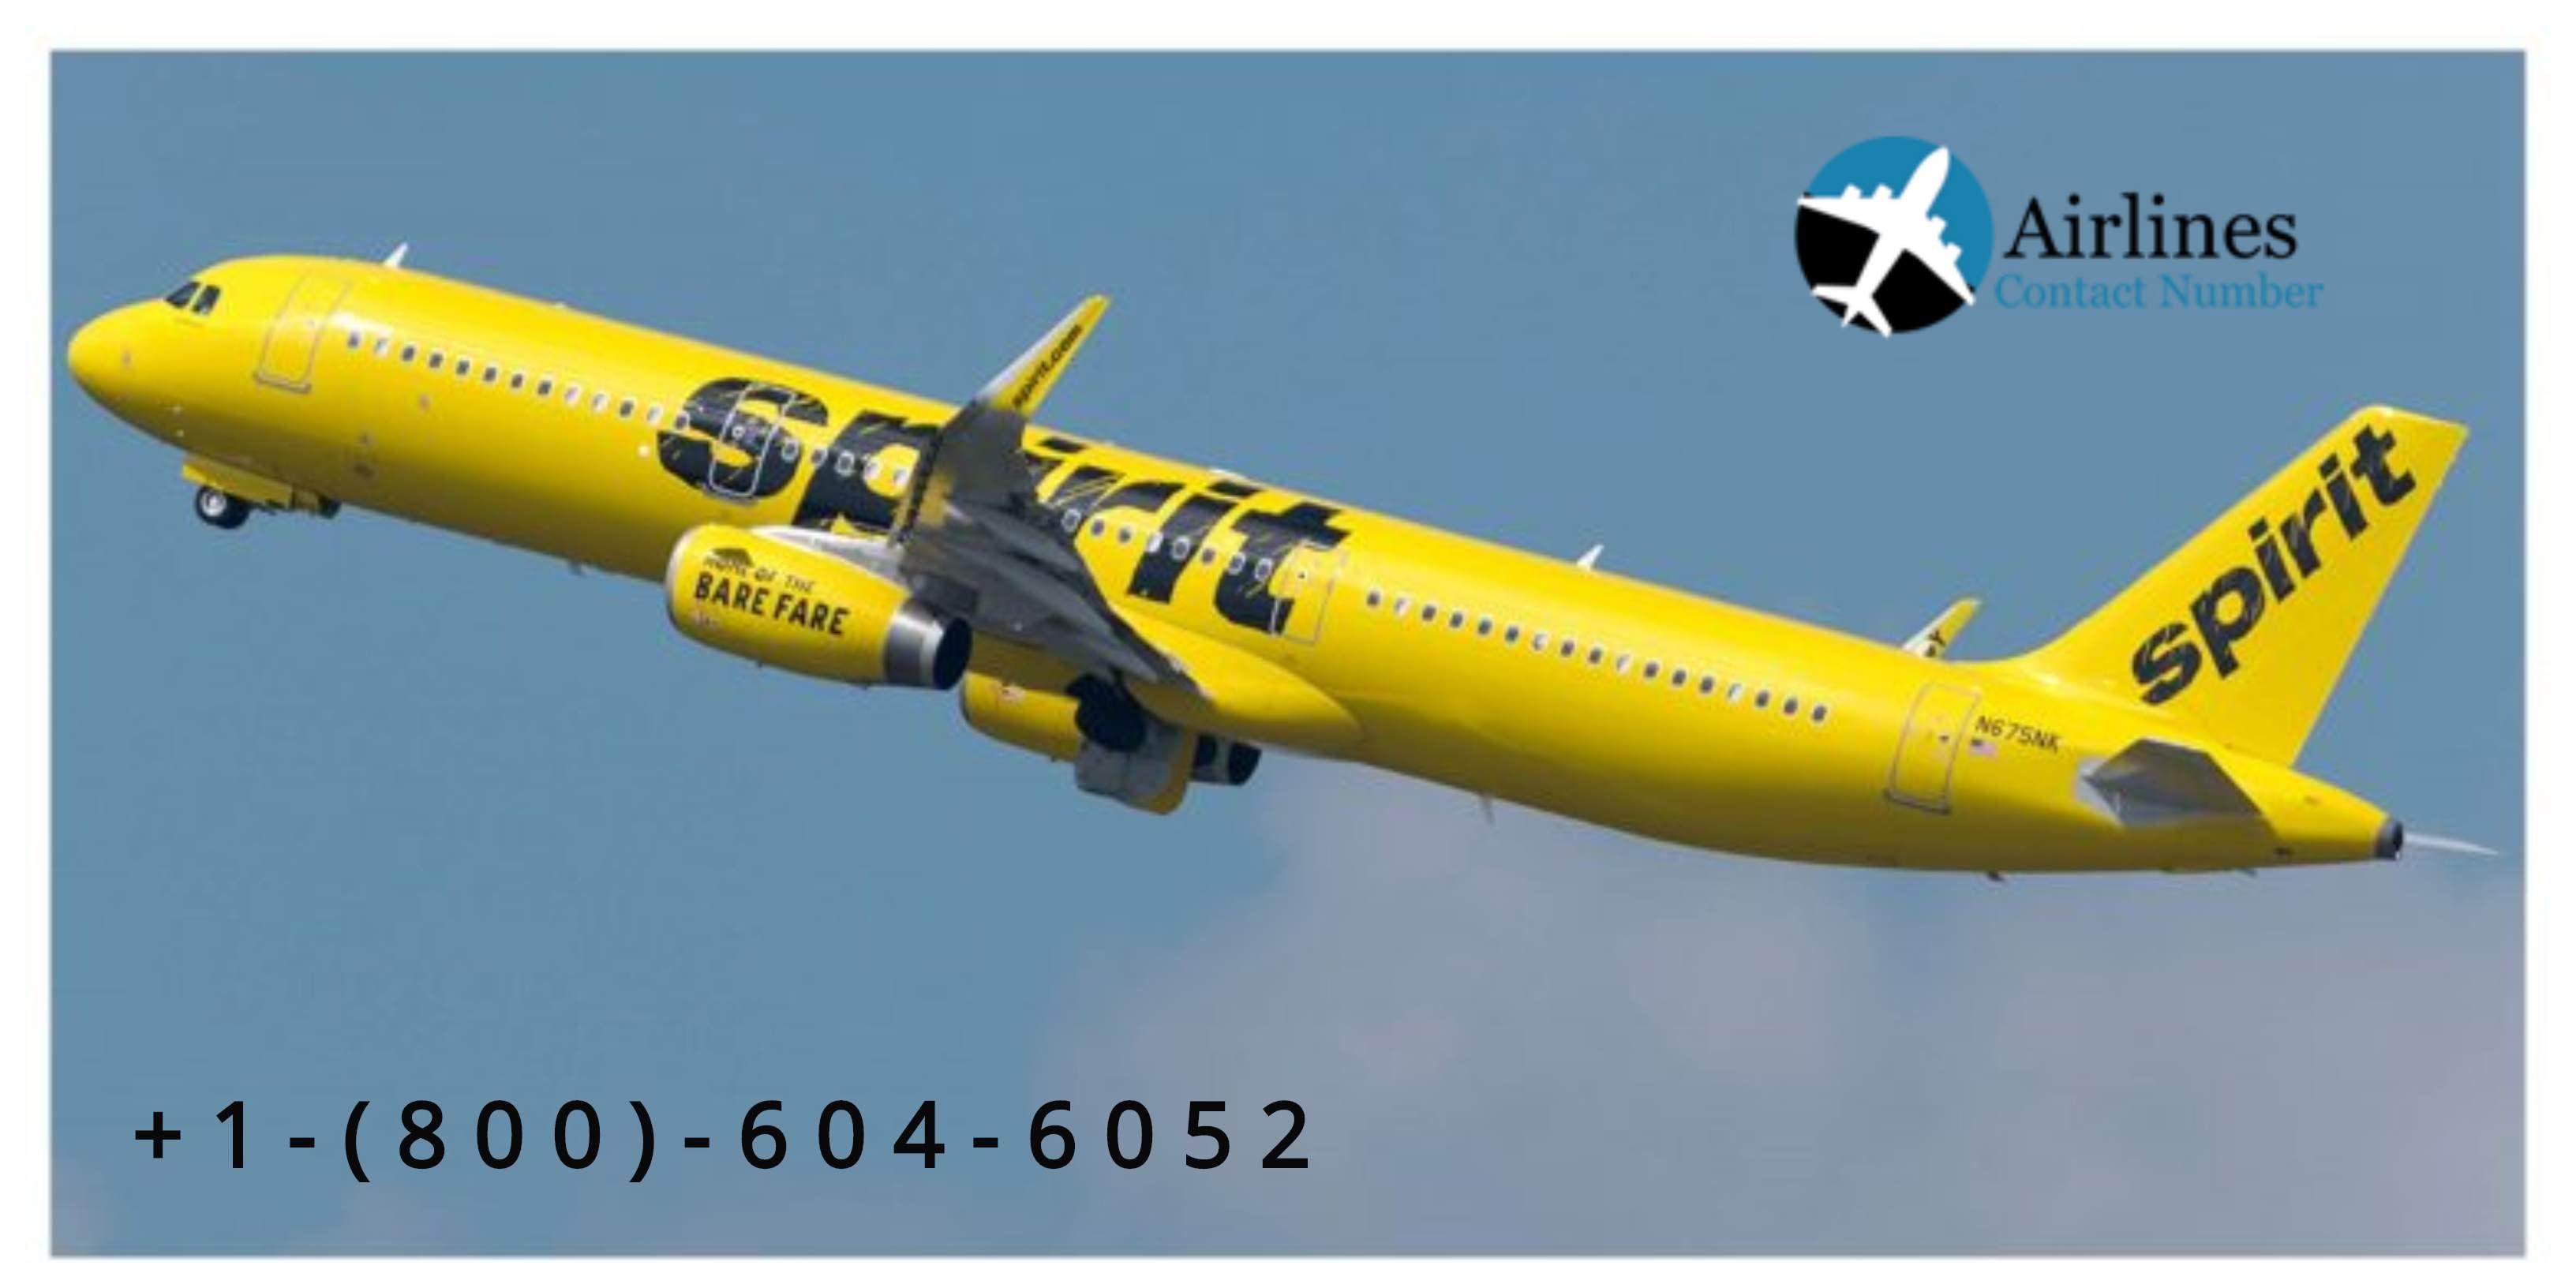 Spirit Airlines Contact Number +18556530296 Spirit